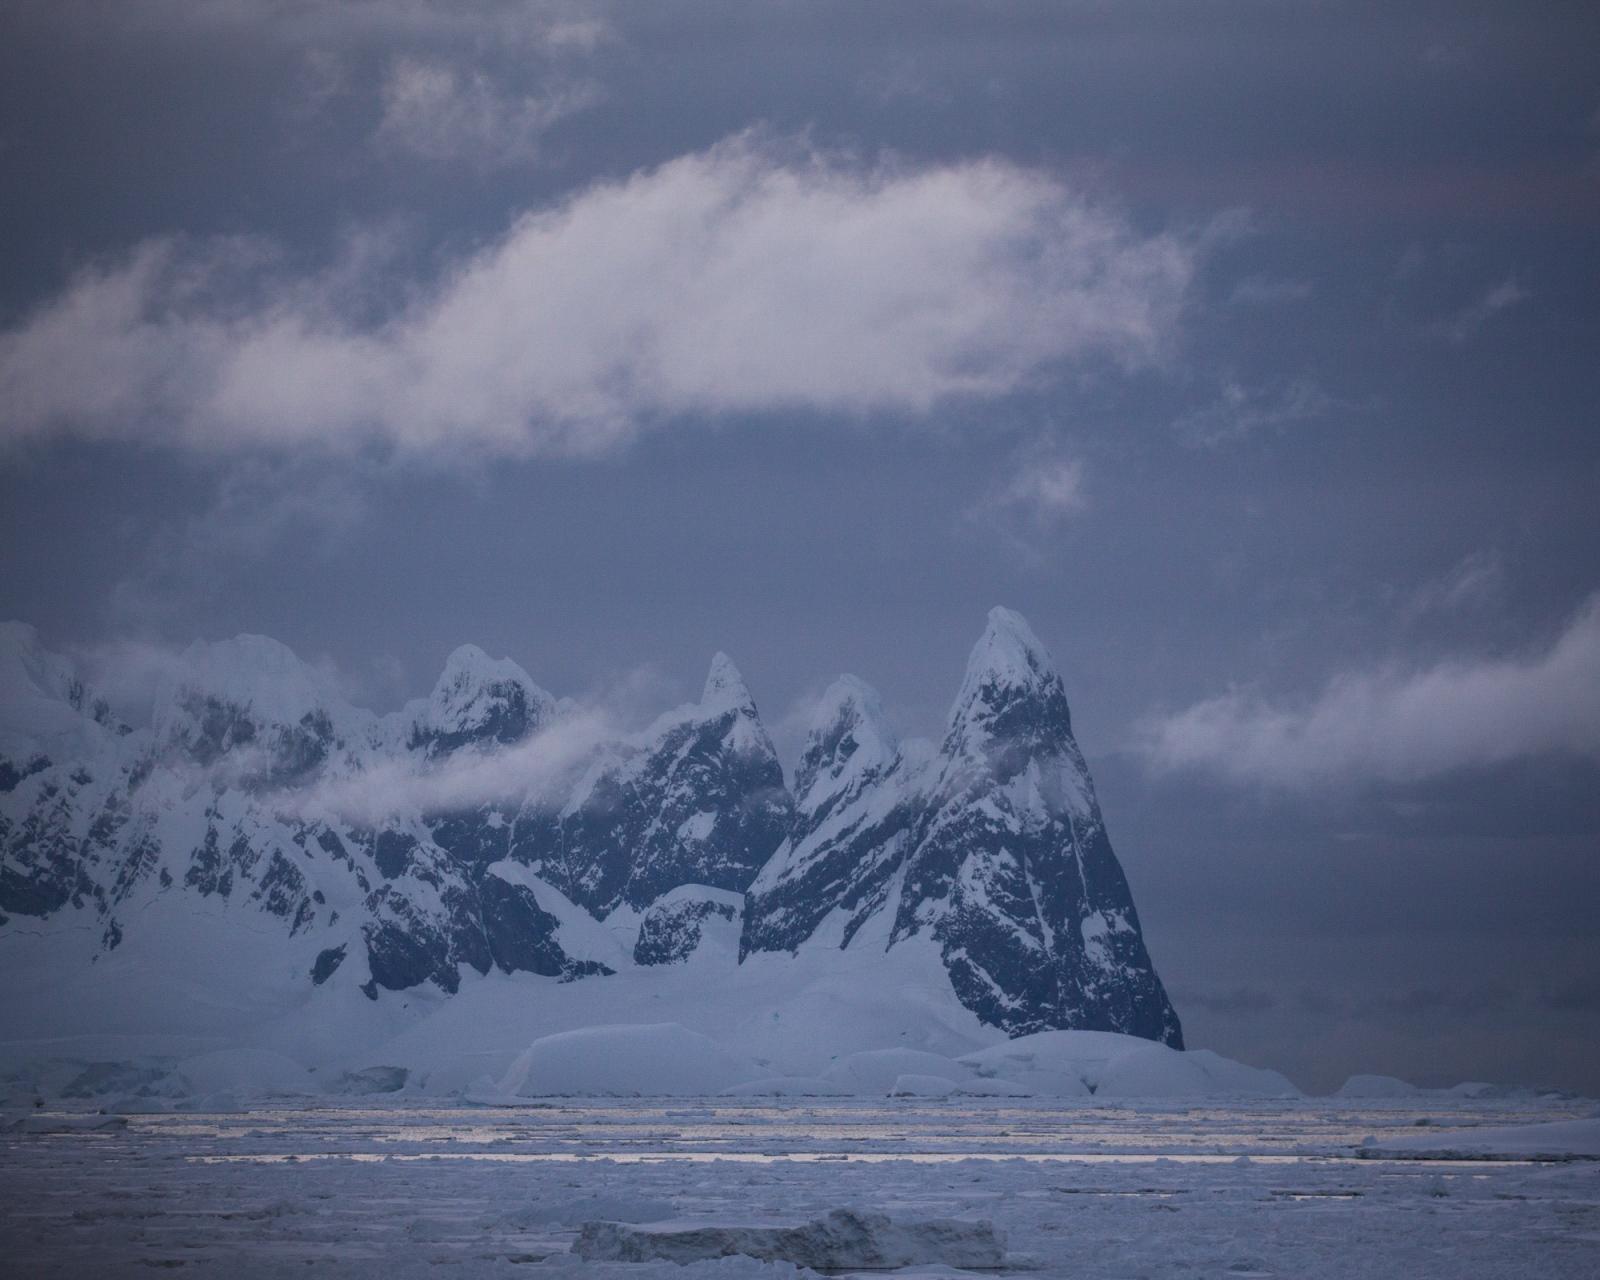 Art and Documentary Photography - Loading 0_Antarctica_UPLOAD_acaciajohnson.jpg